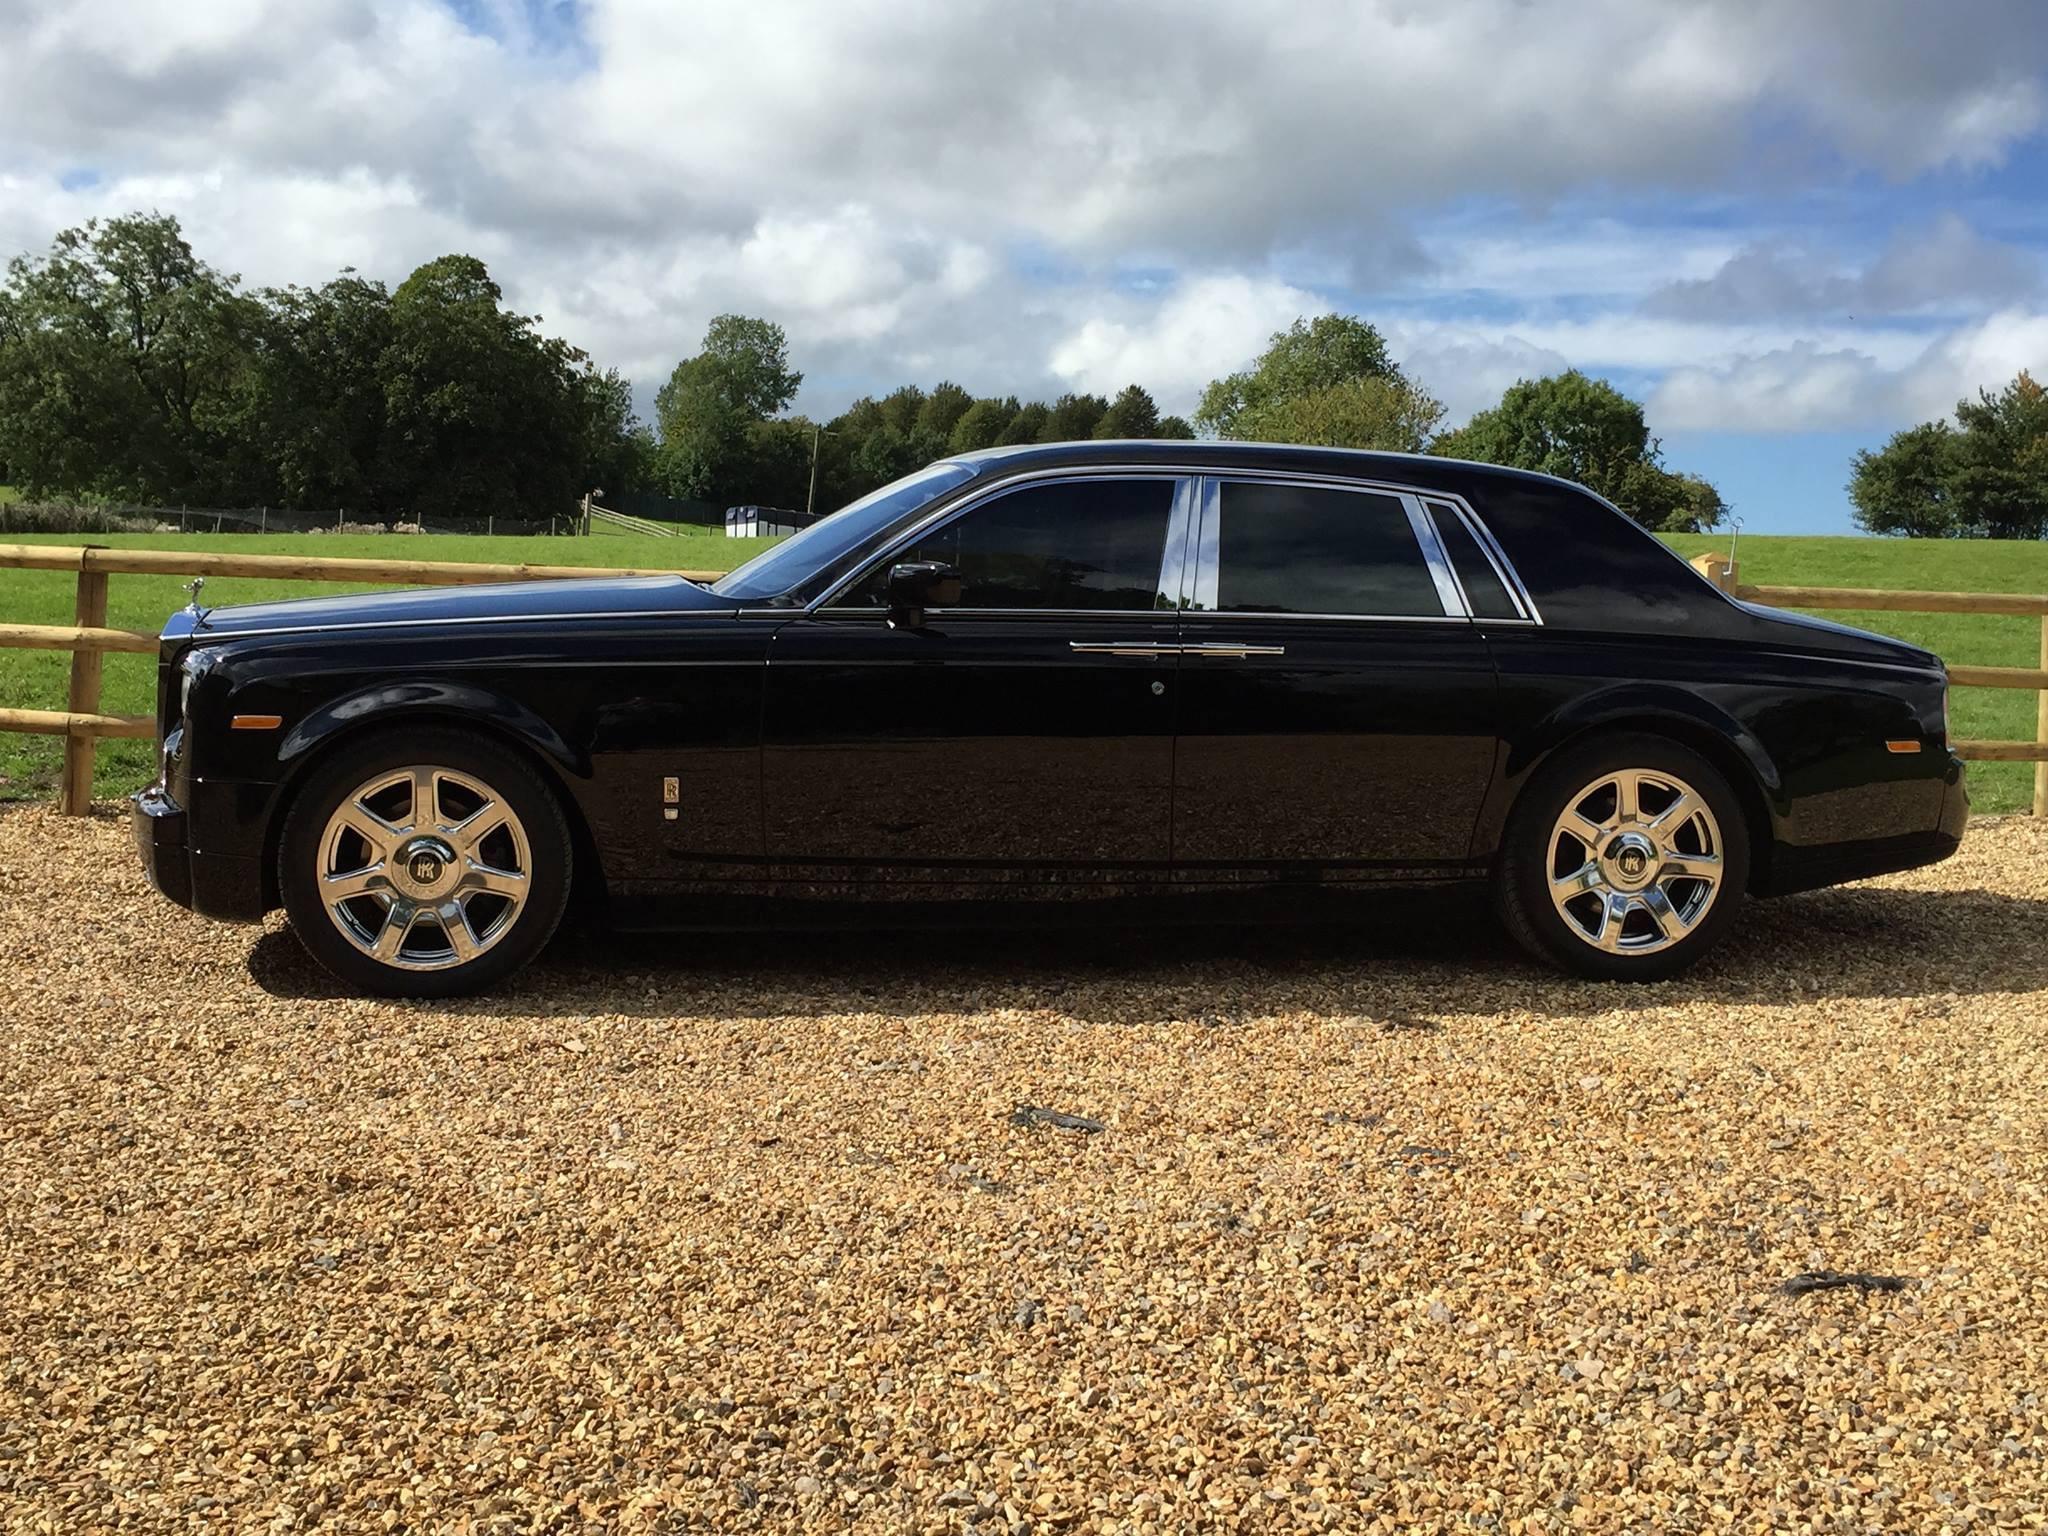 Rolls Royce Phantom Hire Bristol